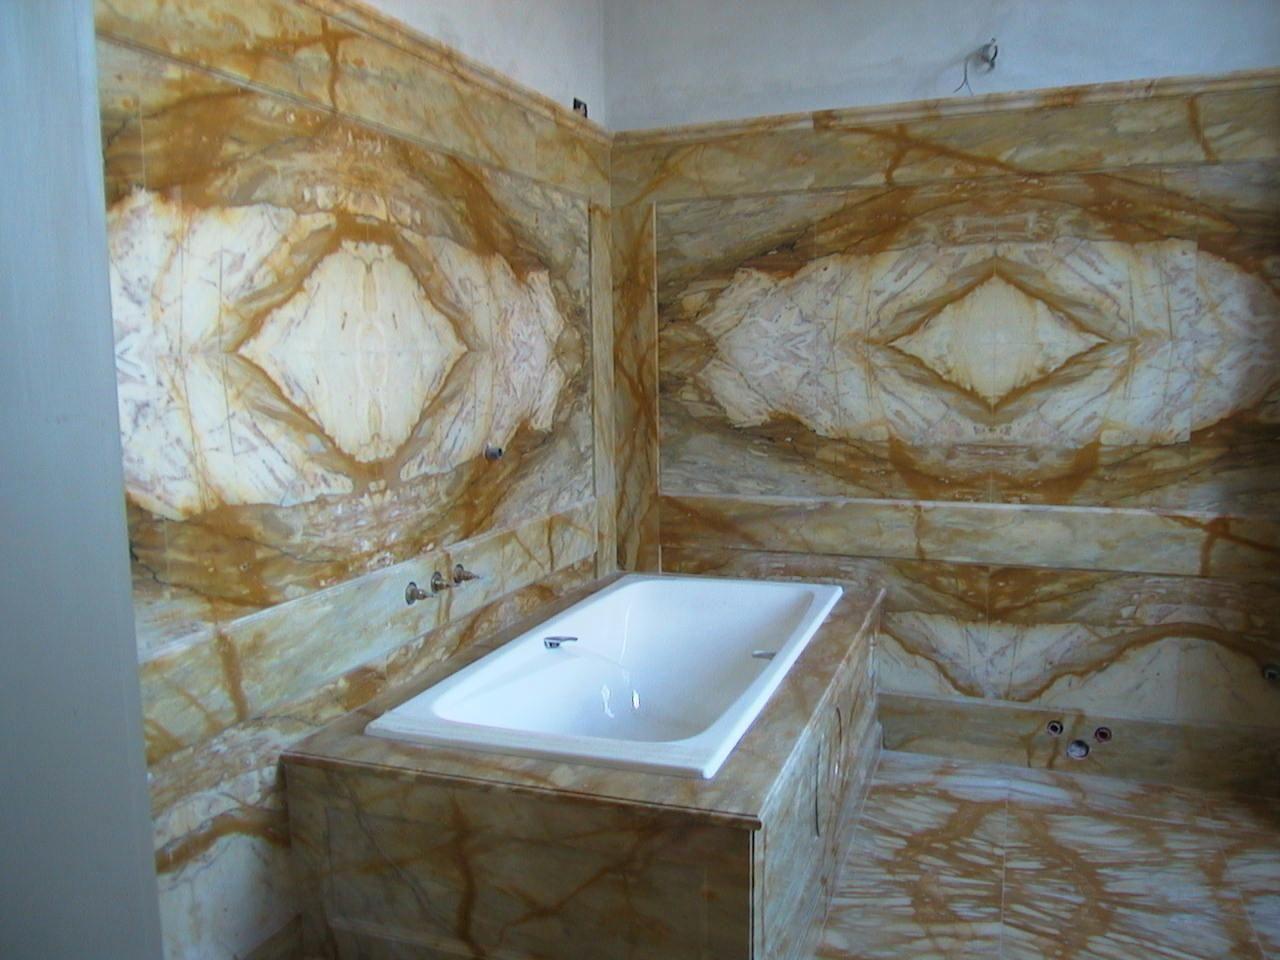 Bagno giallo ~ Bagno in giallo siena statuary marble and design